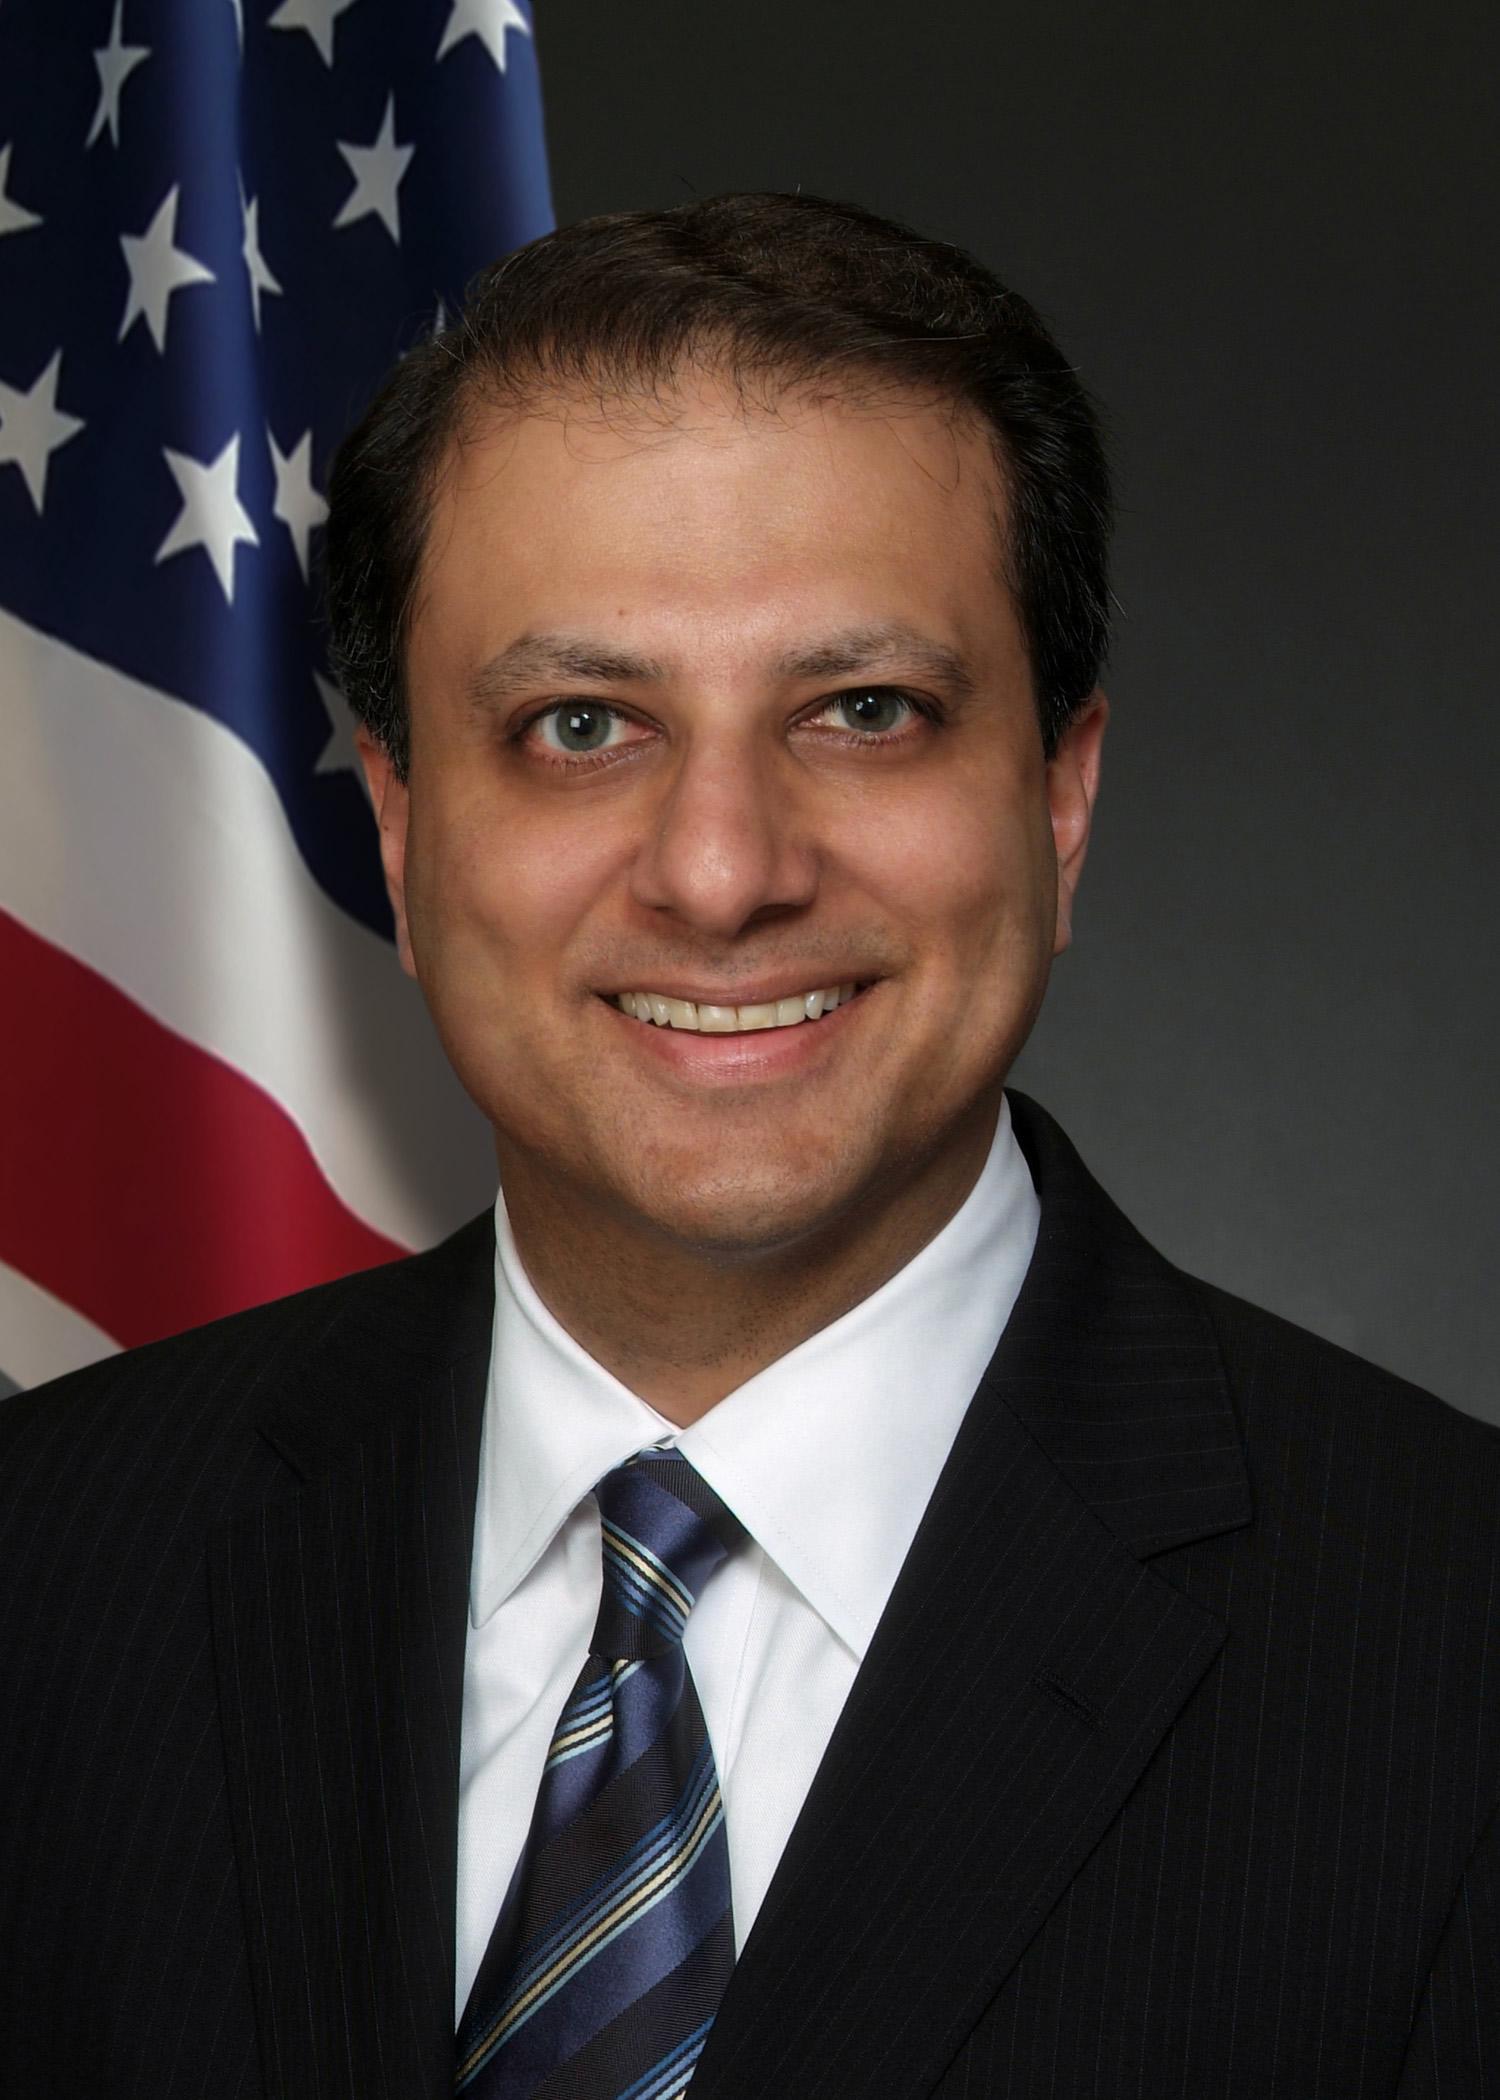 Meet Preet Bharara, US Attorney investigating Clinton Foundation [video]